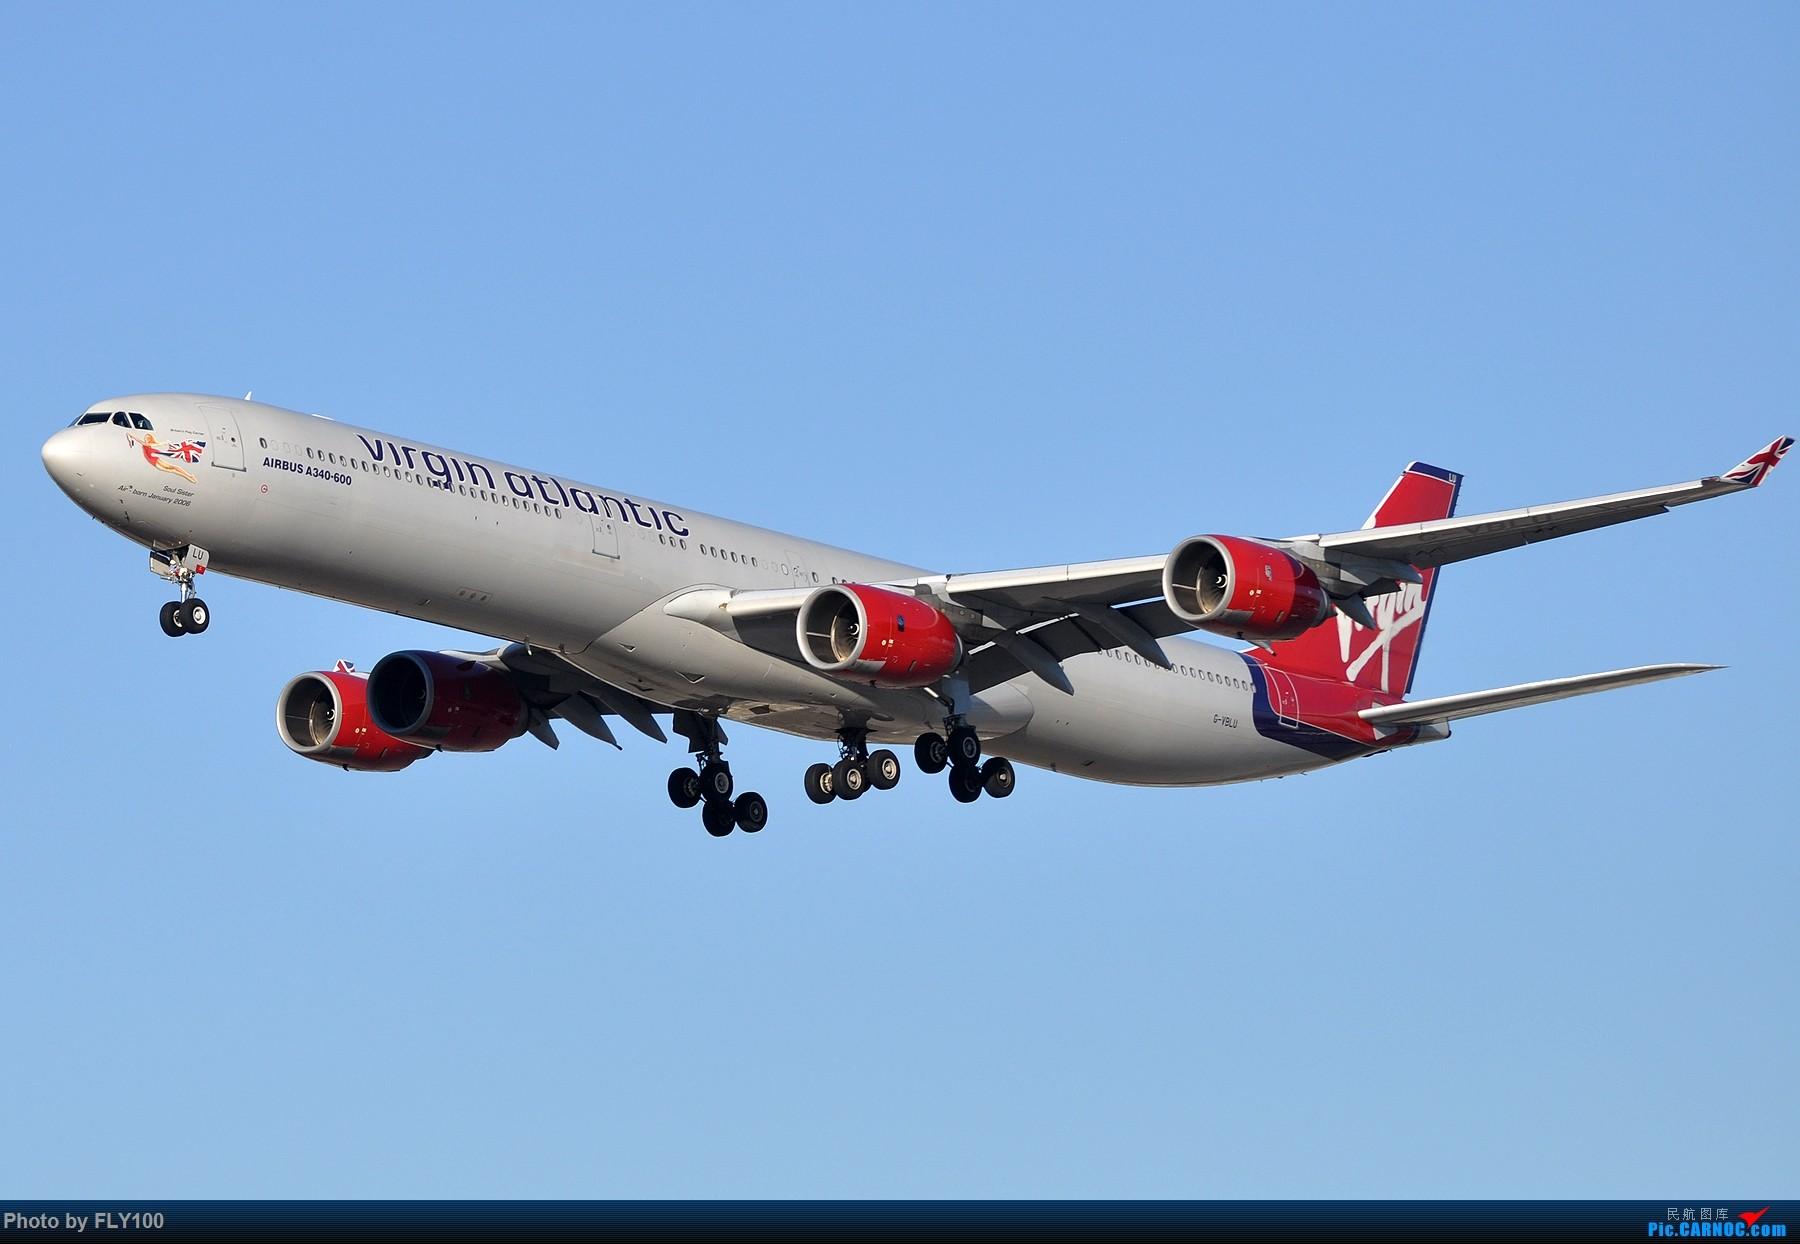 Re:[原创]【LAX】两张AIRBUS A340-600的大图,汉莎航空和维珍大西洋航空 AIRBUS A340-600 G-VBLU 美国洛杉矶机场